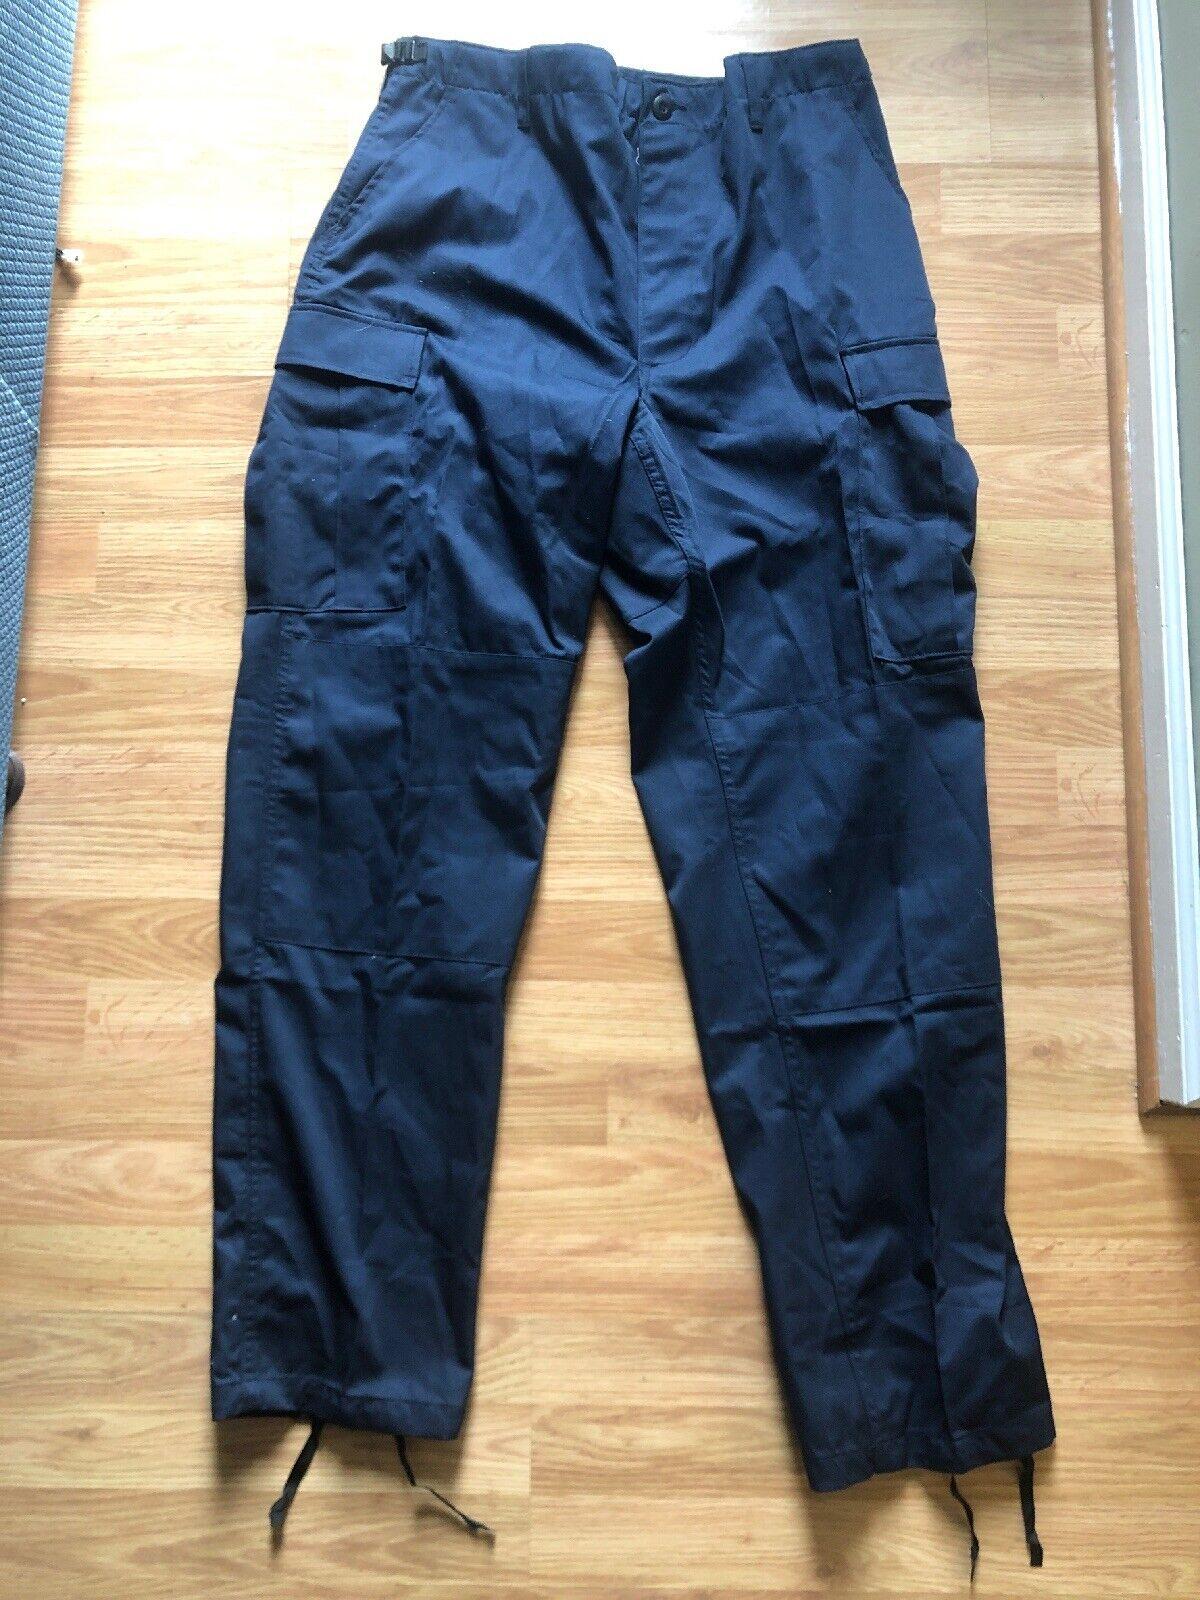 ☀NEW☀Men's Propper BDU Pants Cargo Navy Large Long Tactical Pants